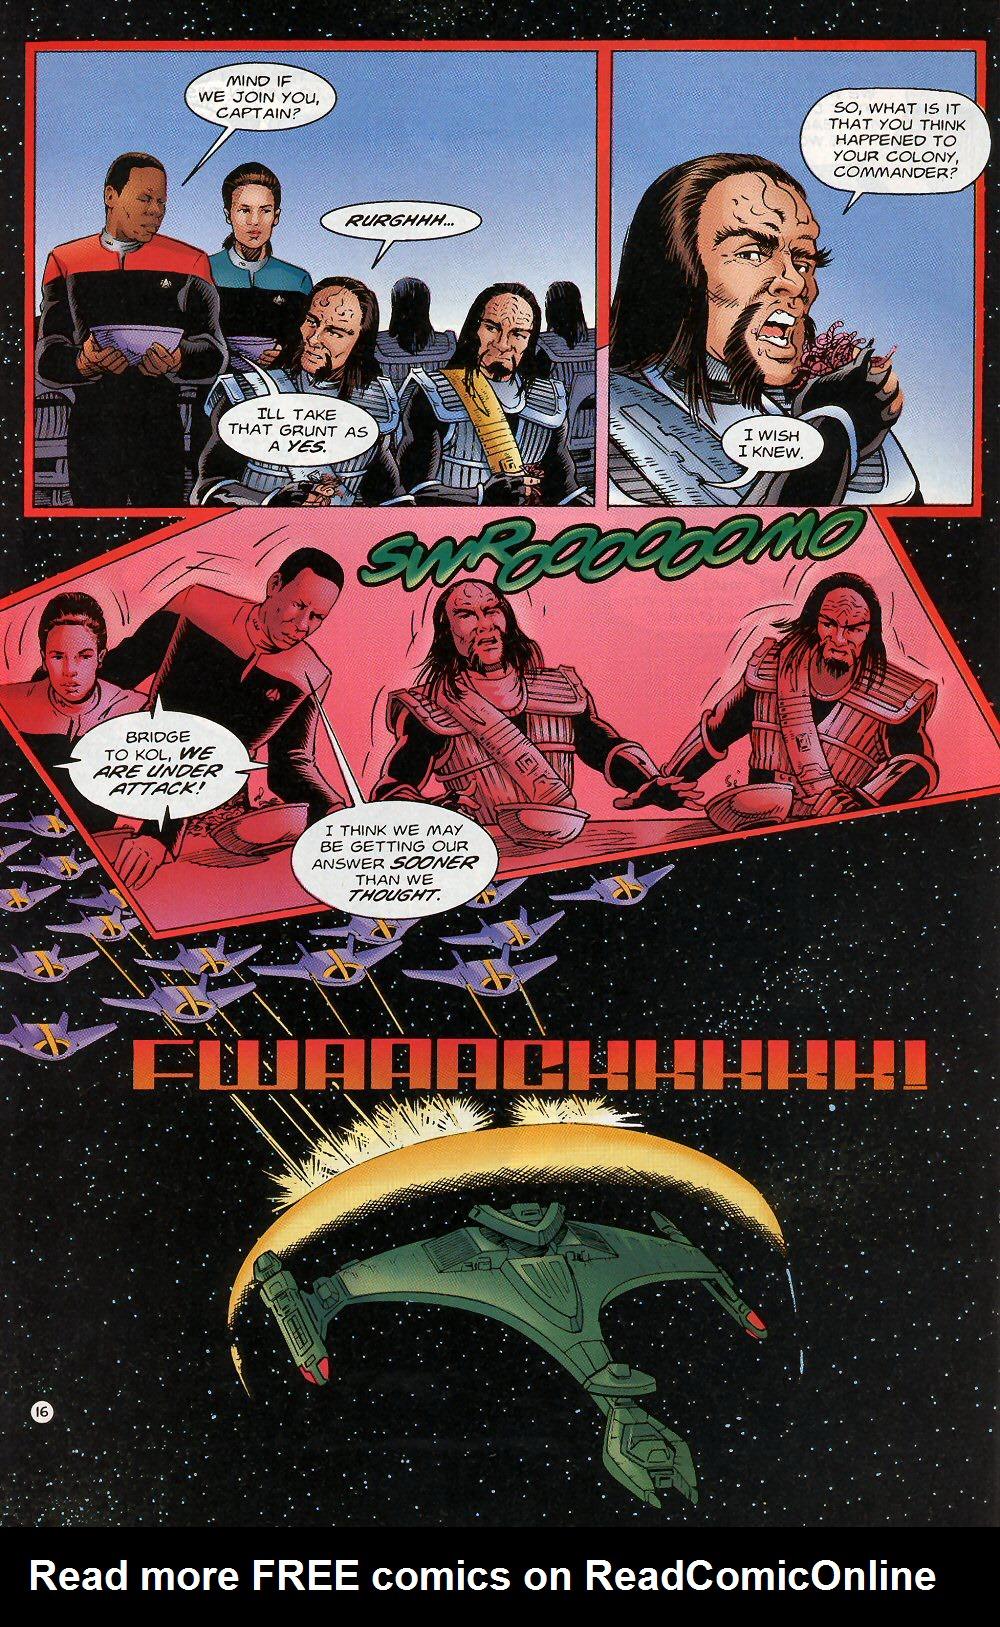 Read online Star Trek: Deep Space Nine - Lightstorm comic -  Issue # Full - 16